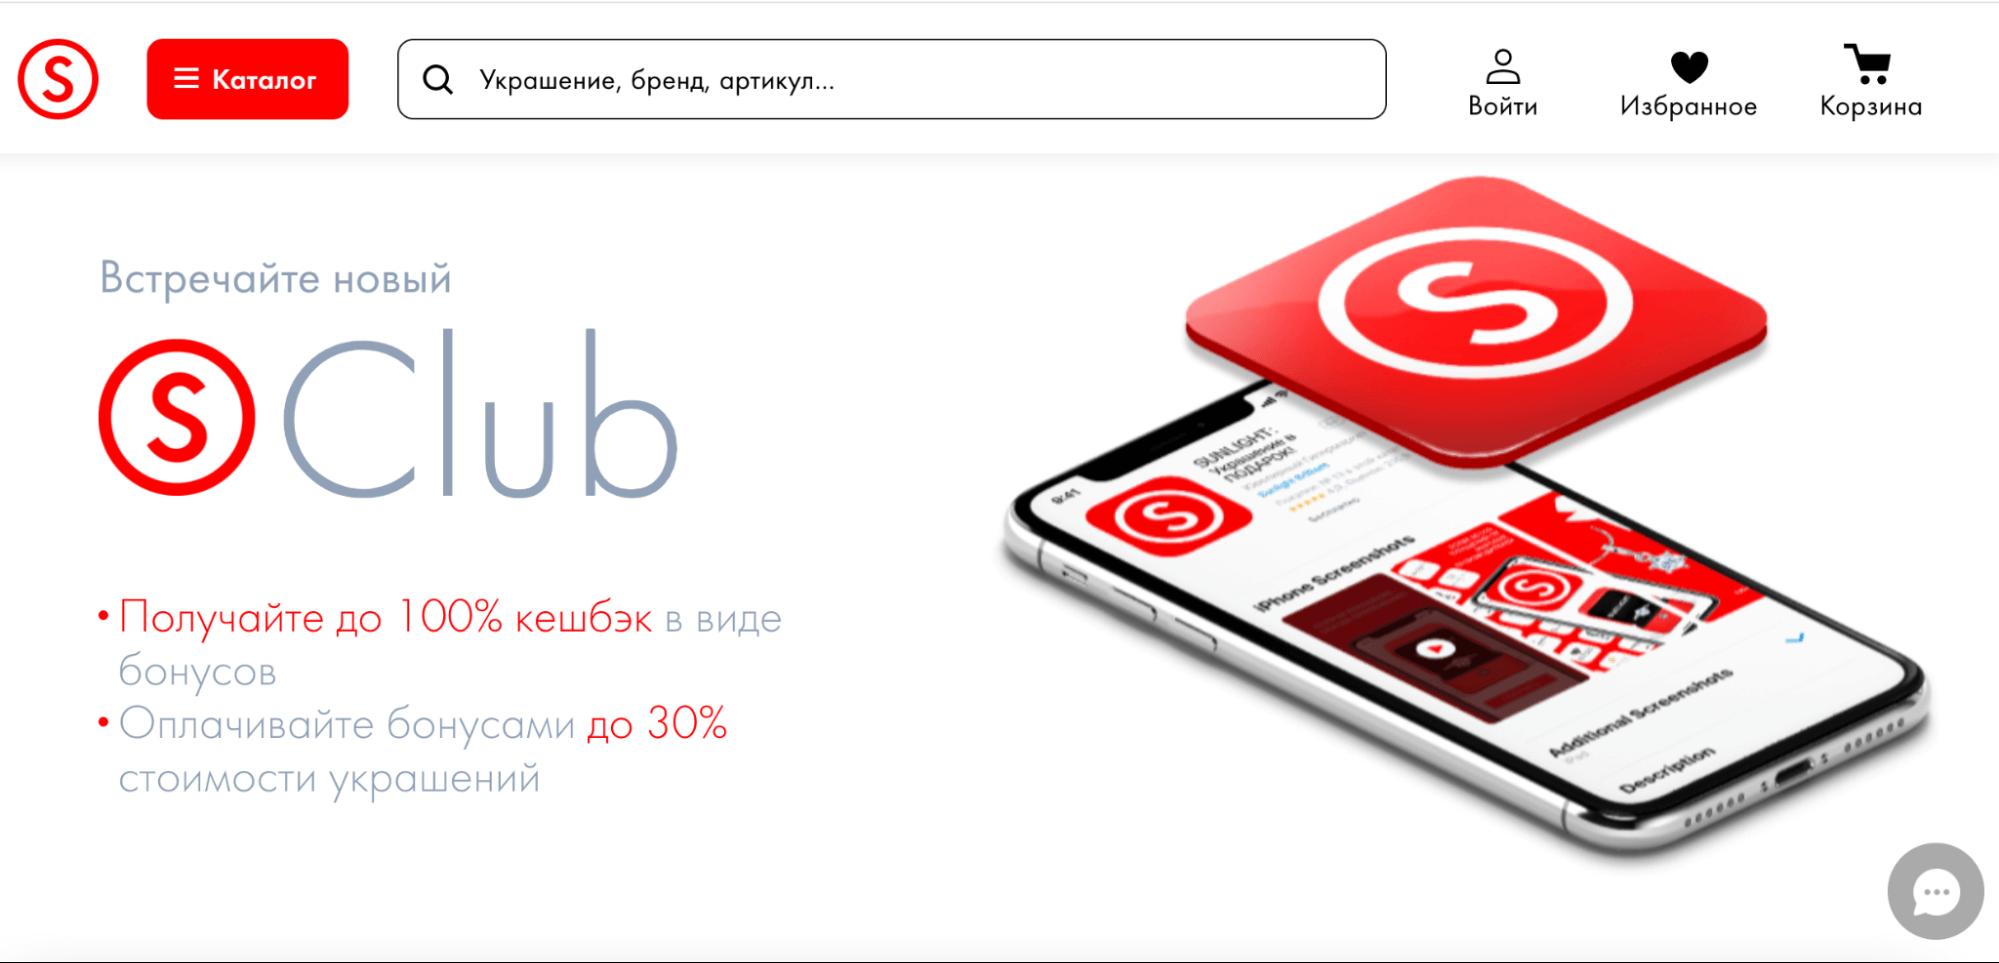 "Бонусная программа интернет-магазина ""Санлайт"""